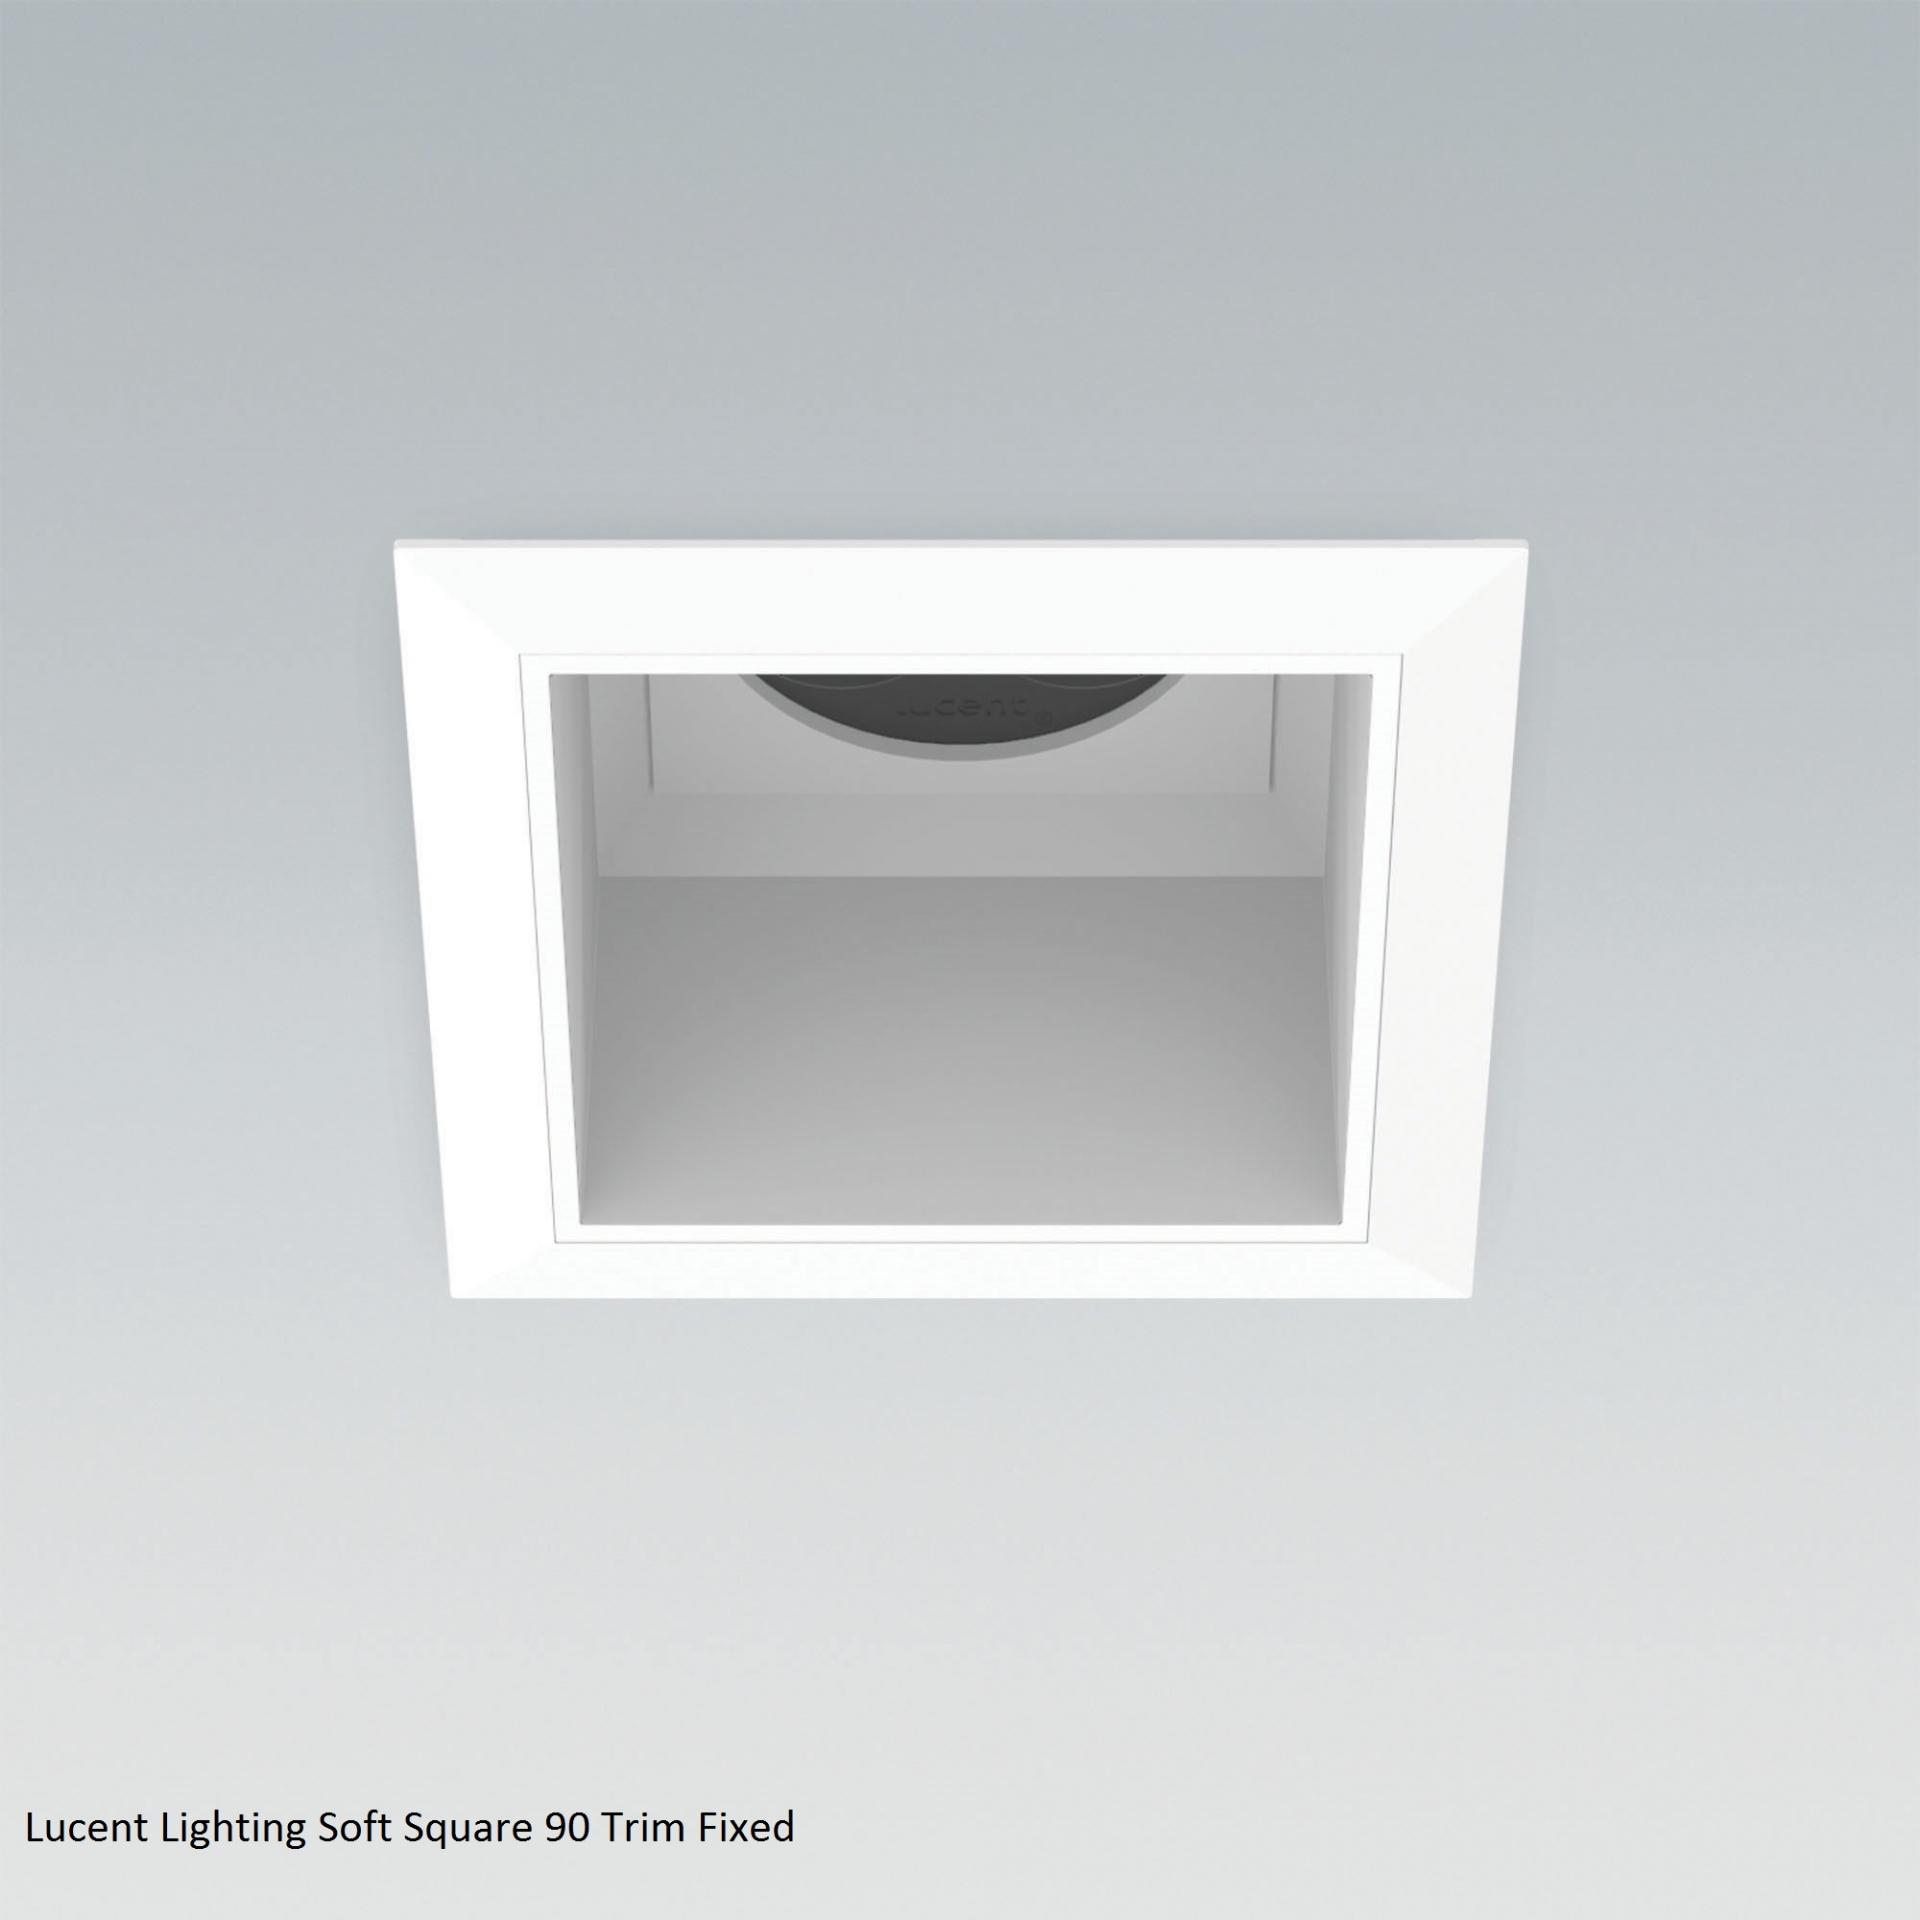 lucent-lighting-soft-square-90-trim-fixed1552991040